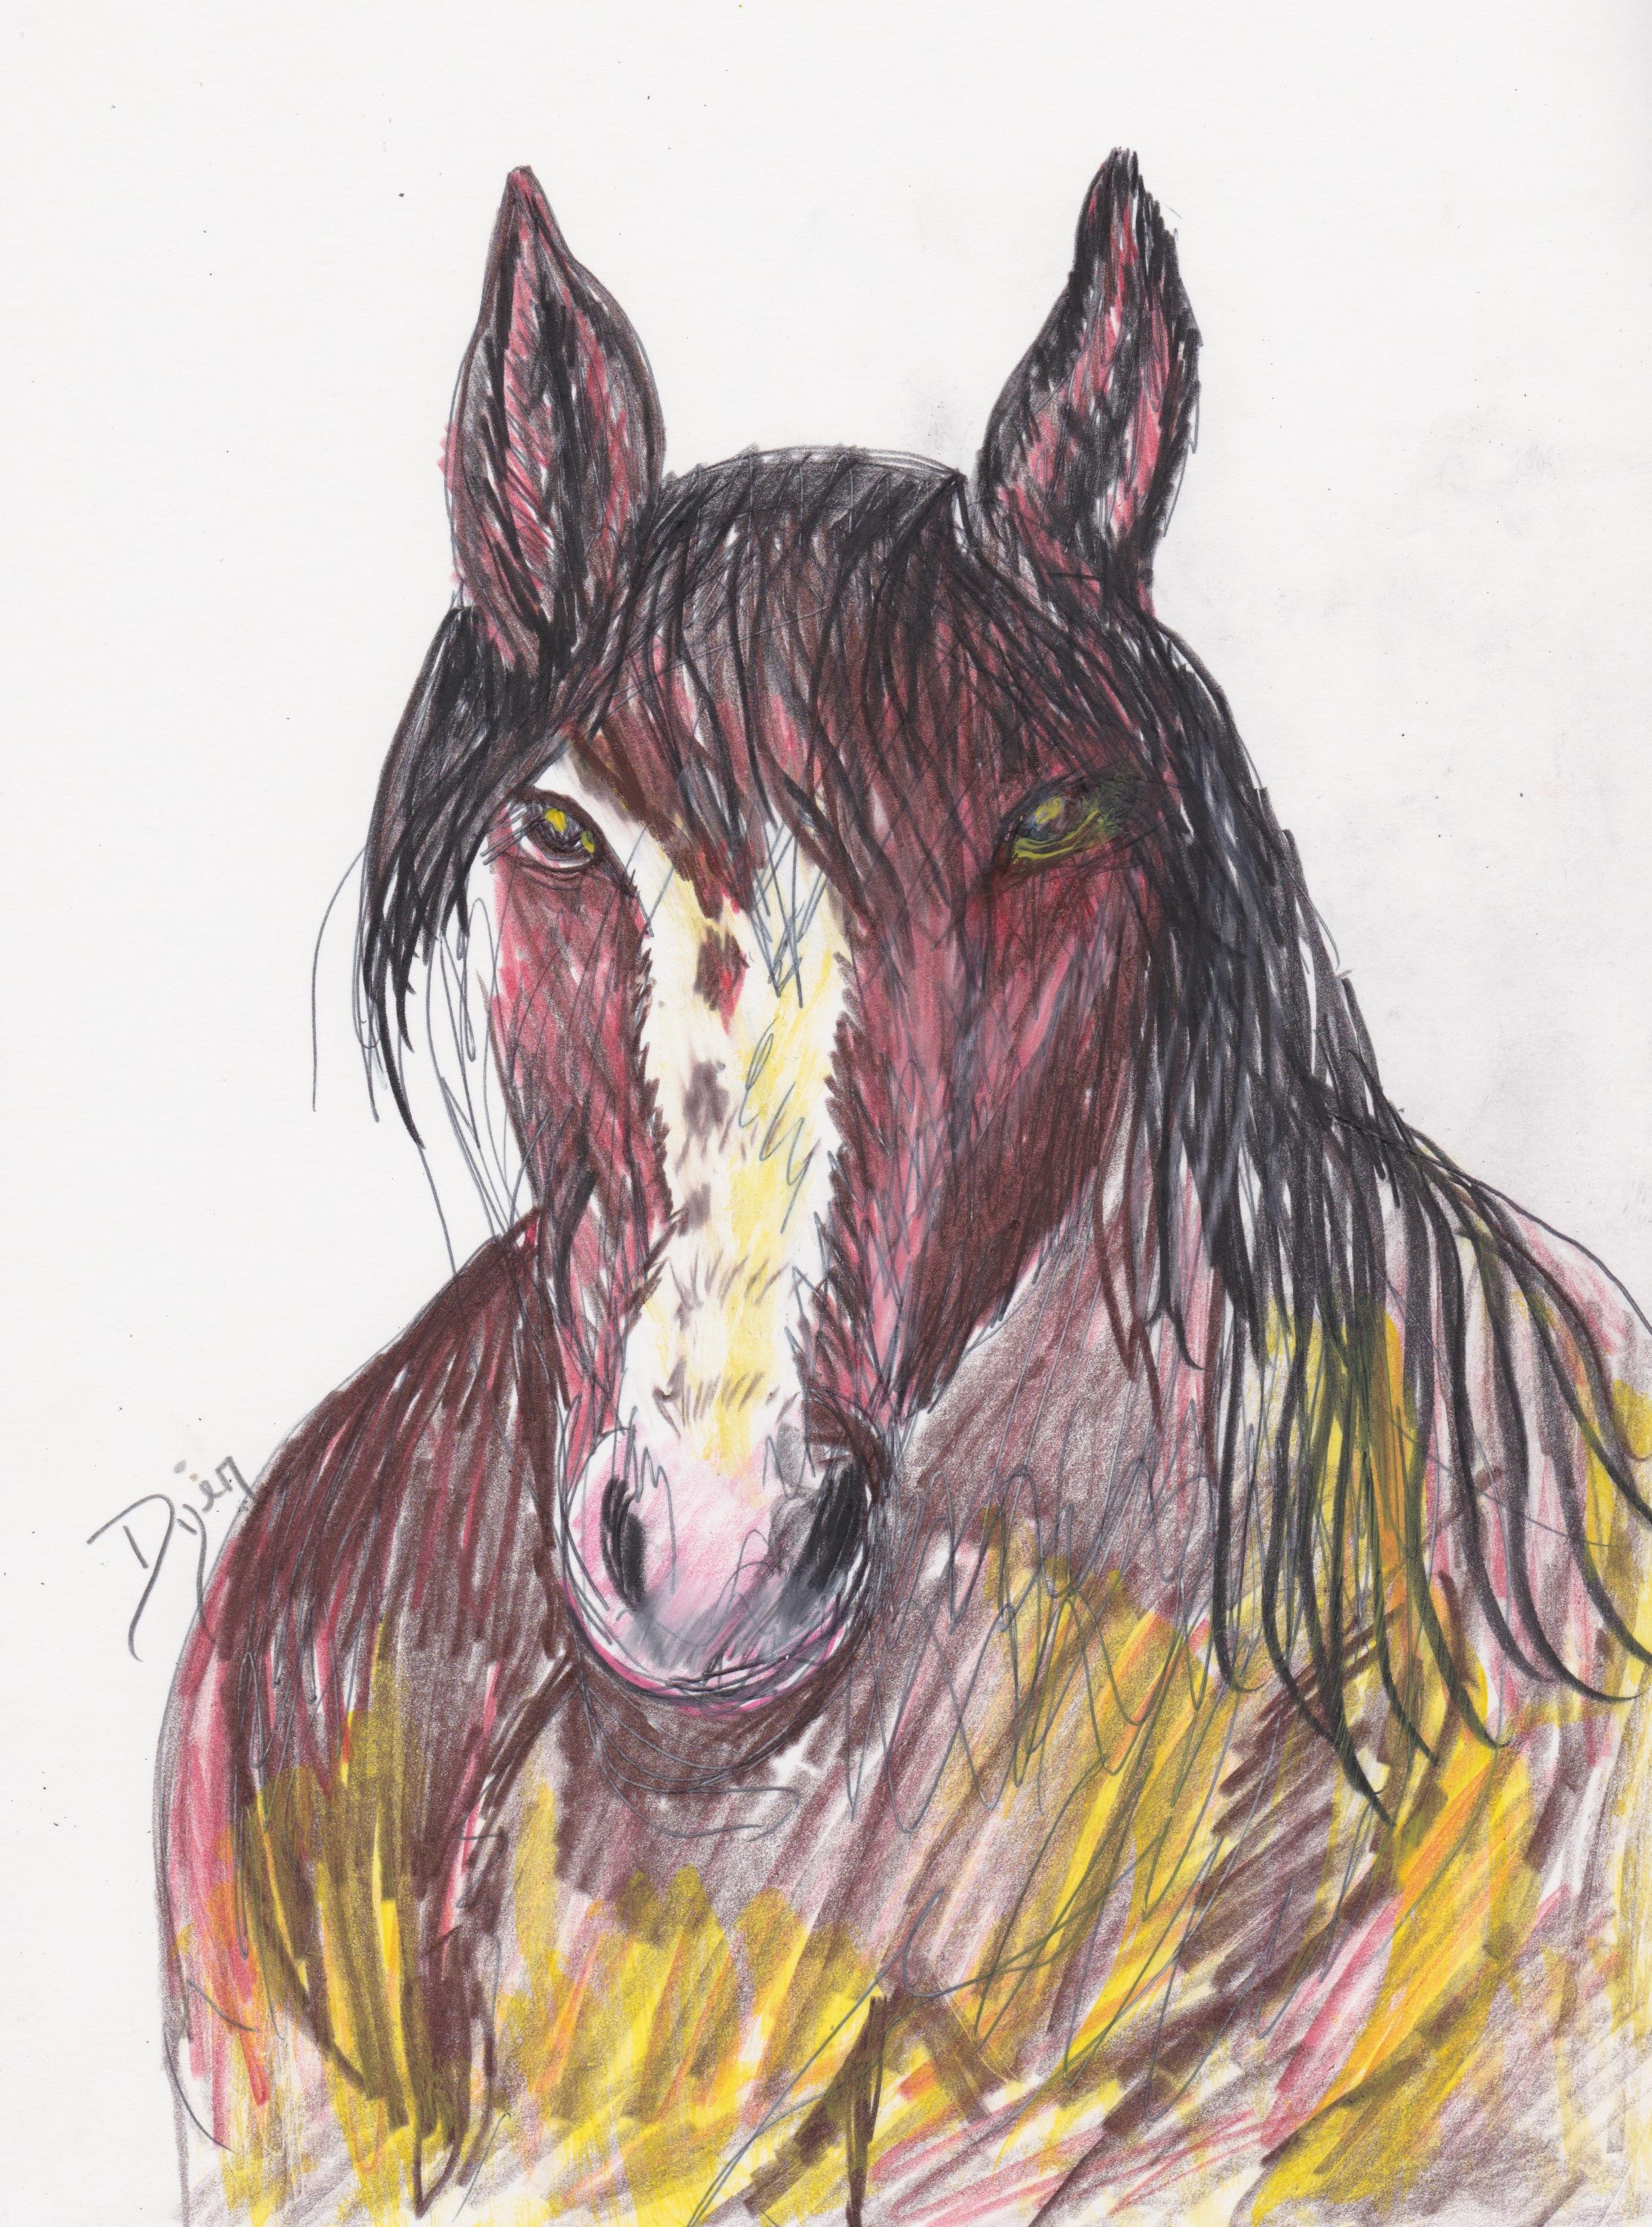 Horse colored pencil